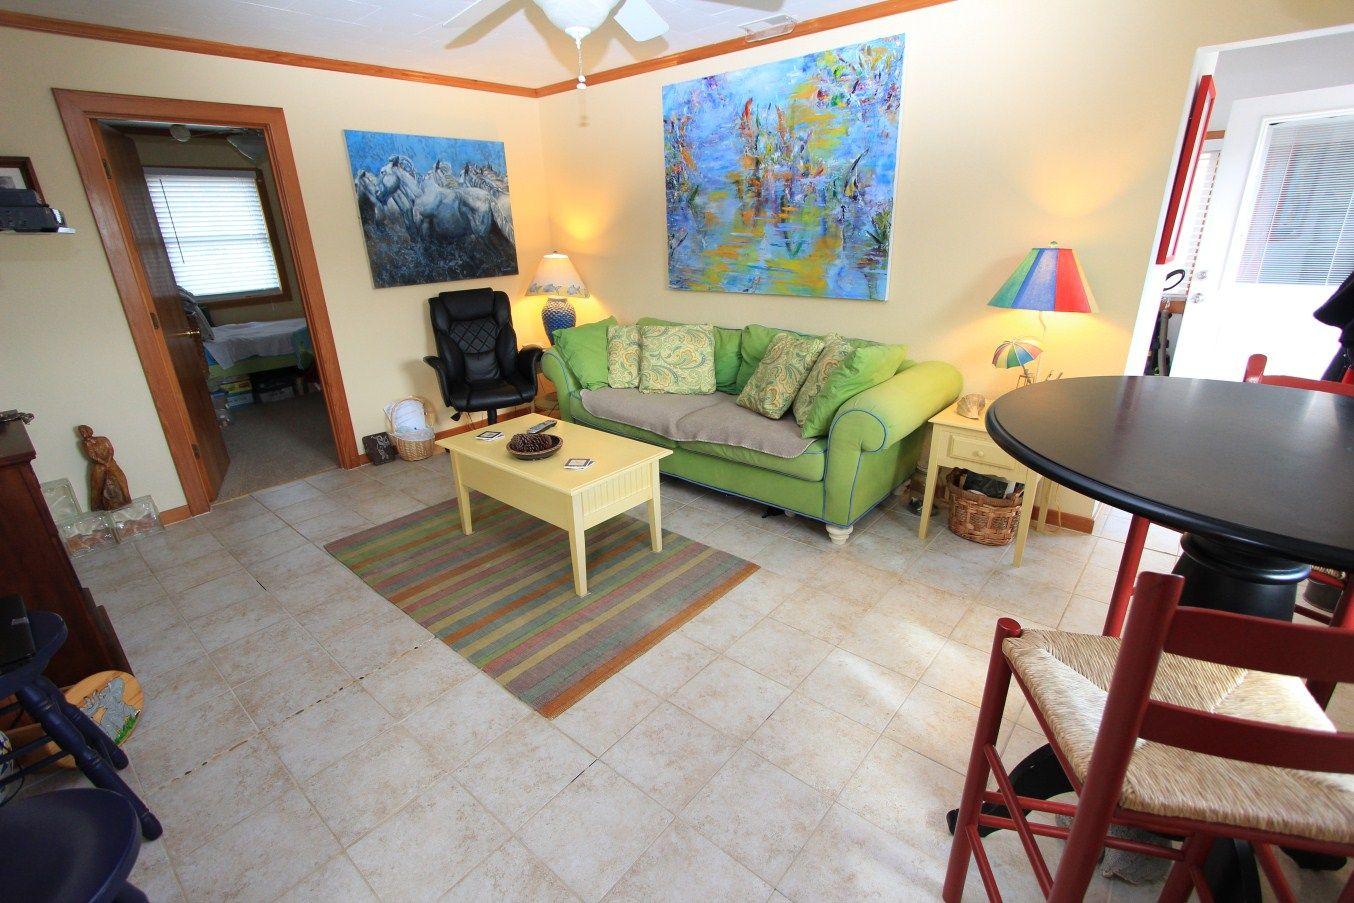 Living room area | Nc real estate, Home decor, Real estate ...